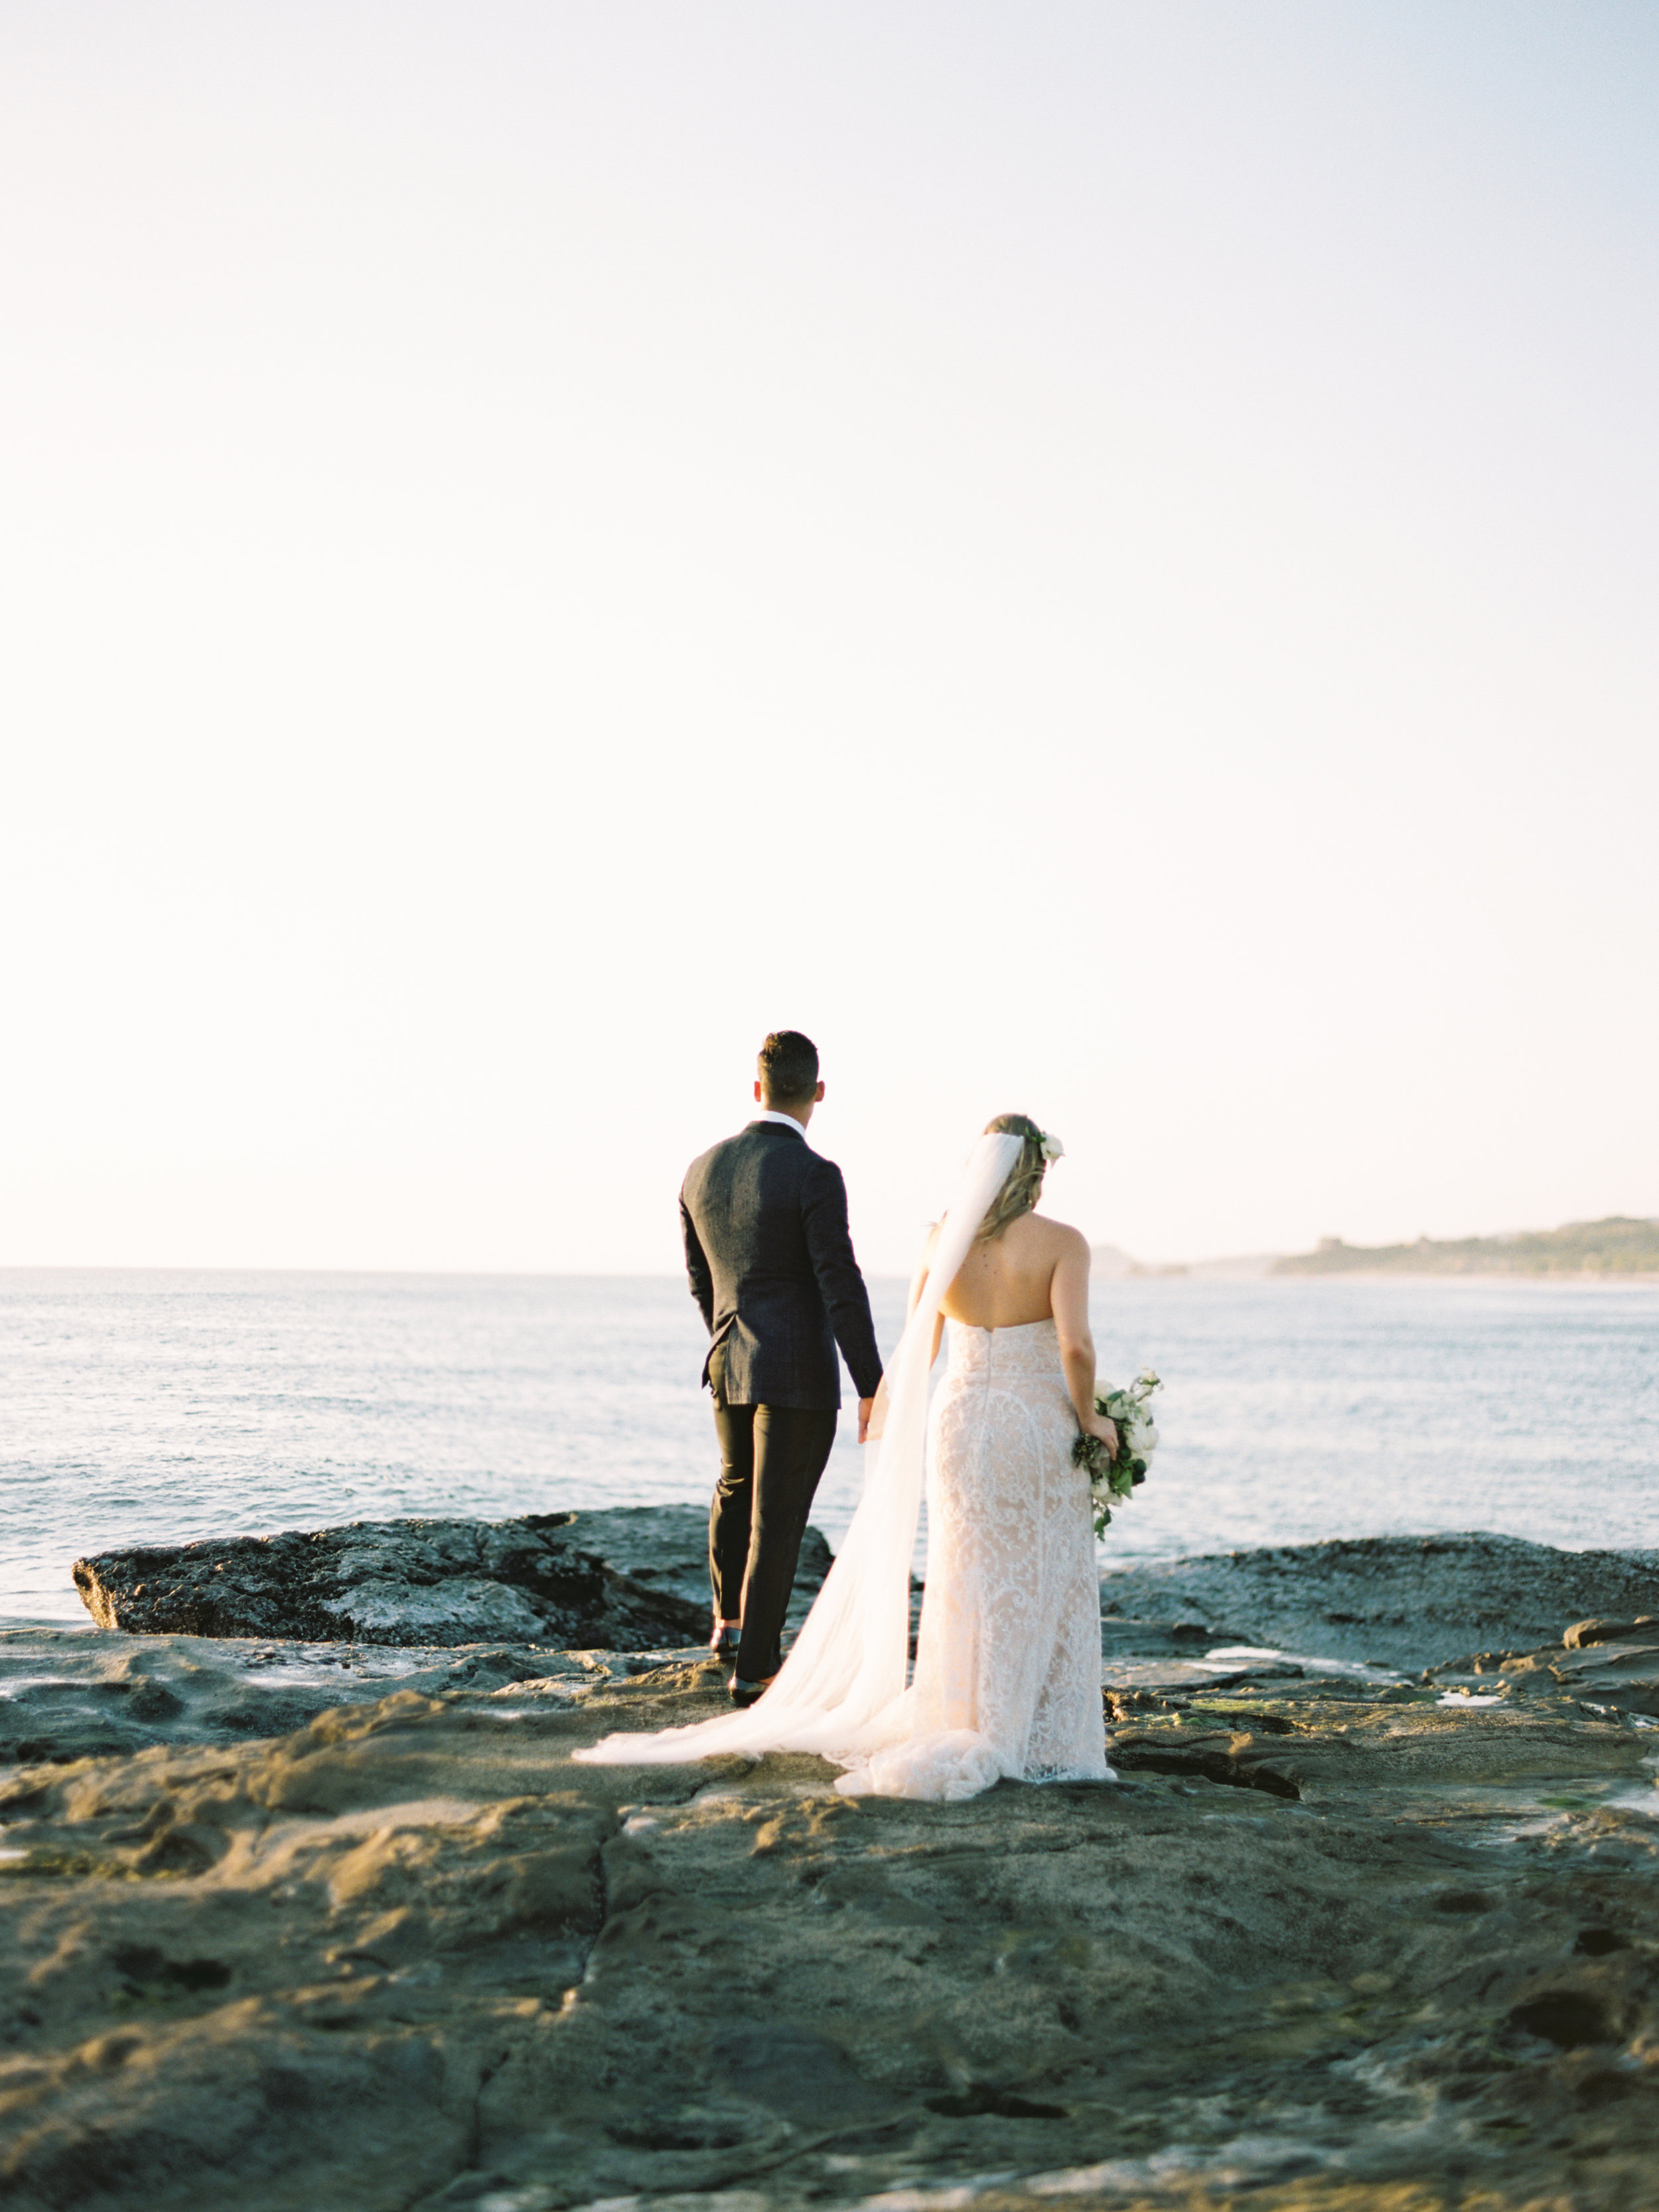 555-fine-art-film-photographer-destination-wedding-nicaragua-jacob+cammye-brumley & wells.jpg